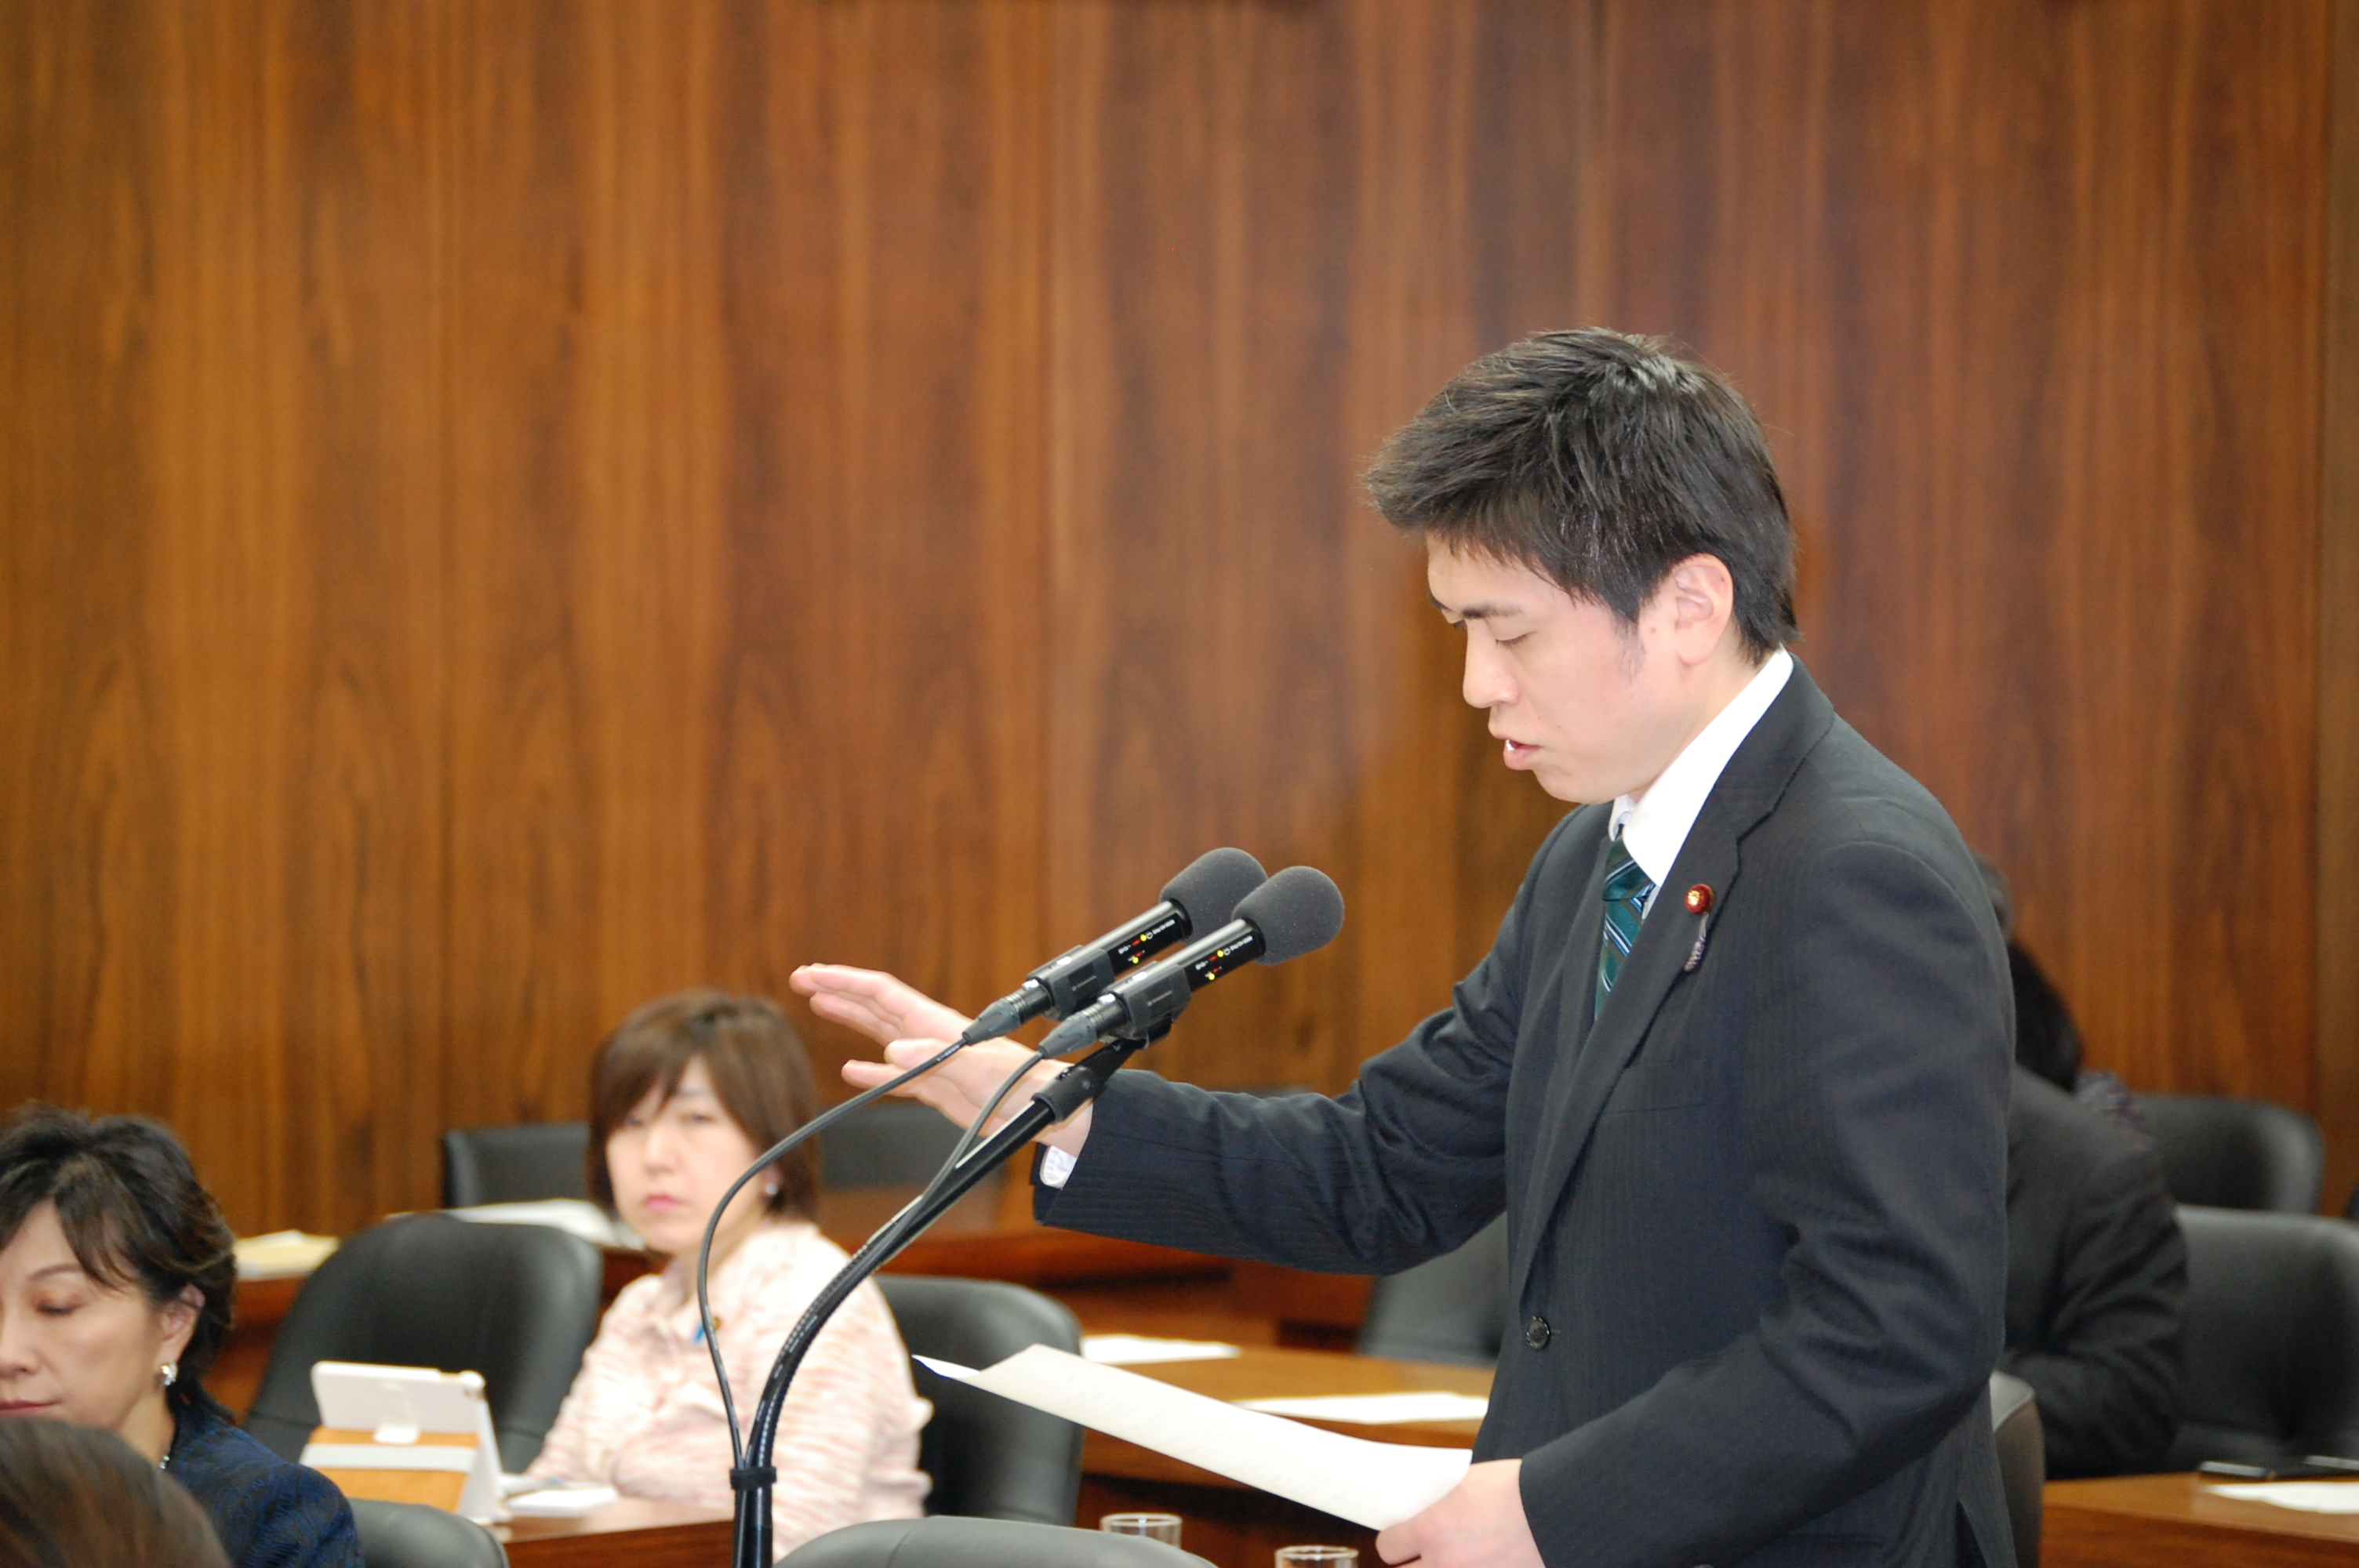 経済産業委員会で質問、党の復興加速化本部に参加